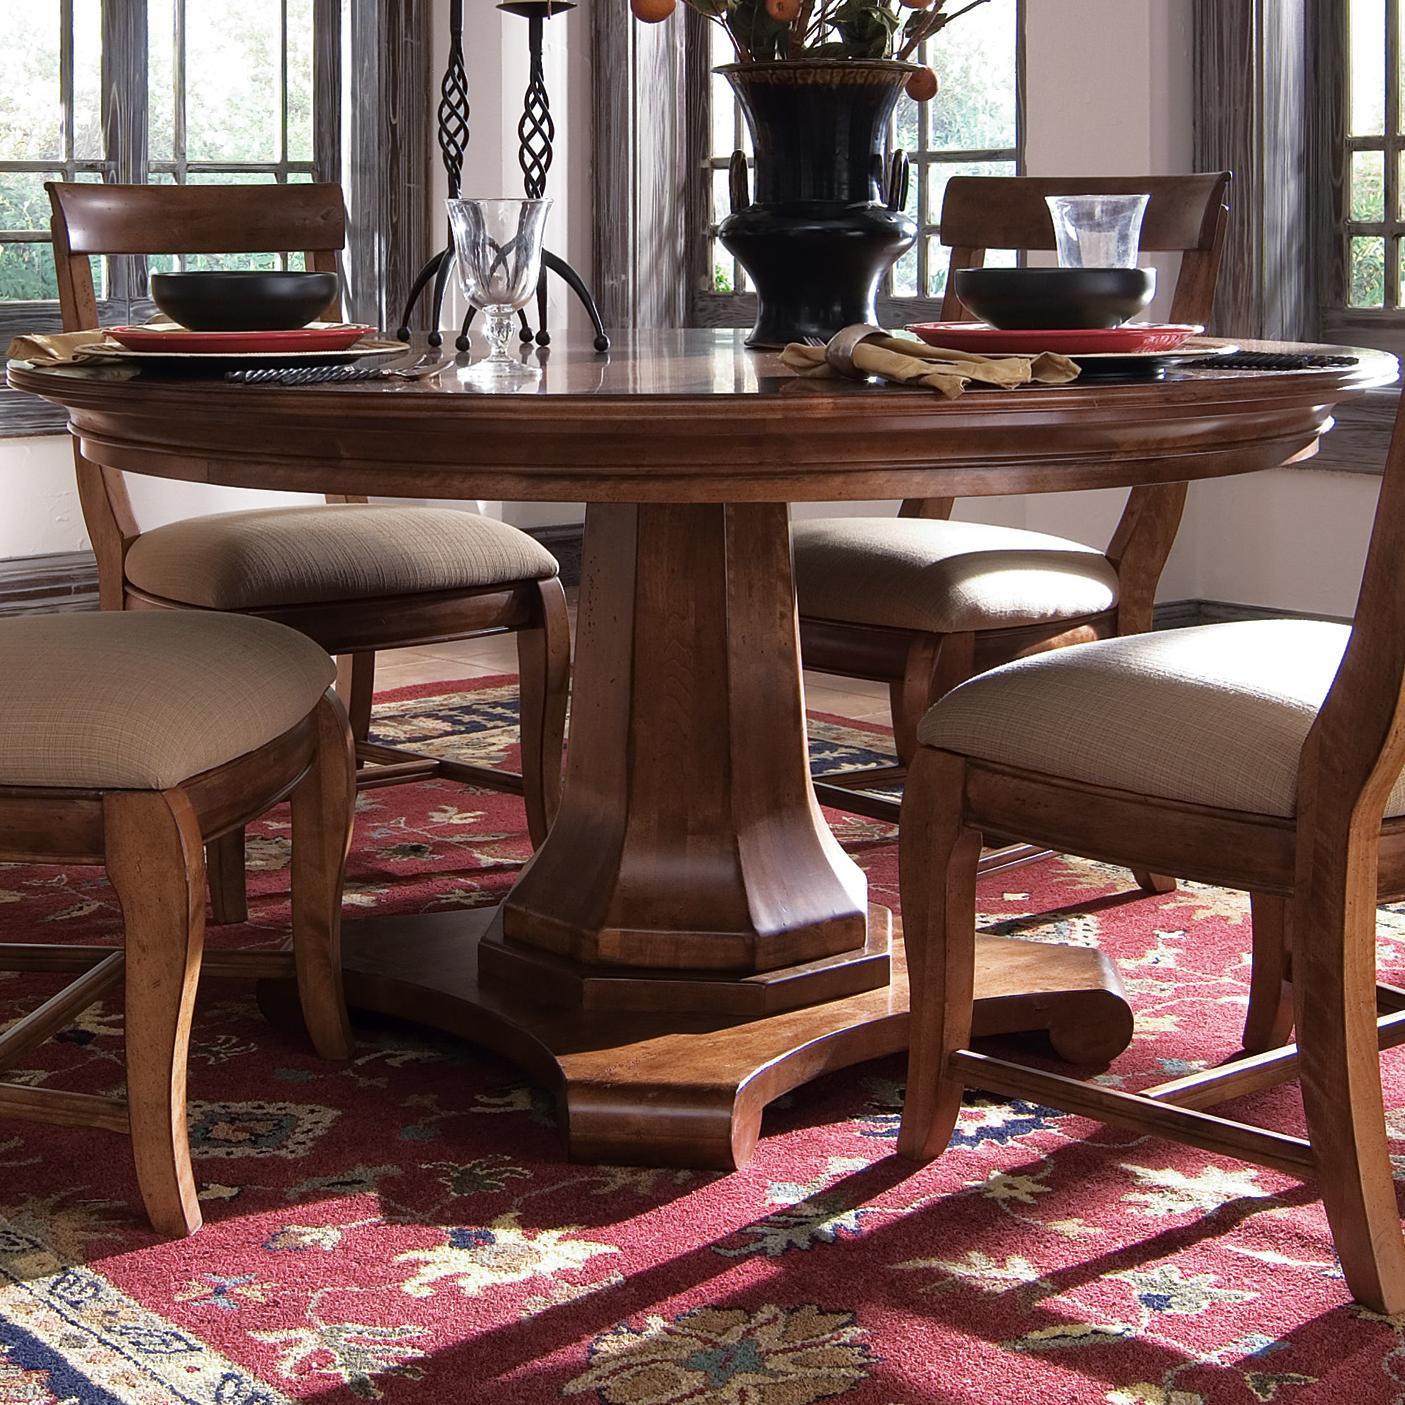 Kincaid Furniture Tuscano 58 Round Dining Table Item Number 96002 052